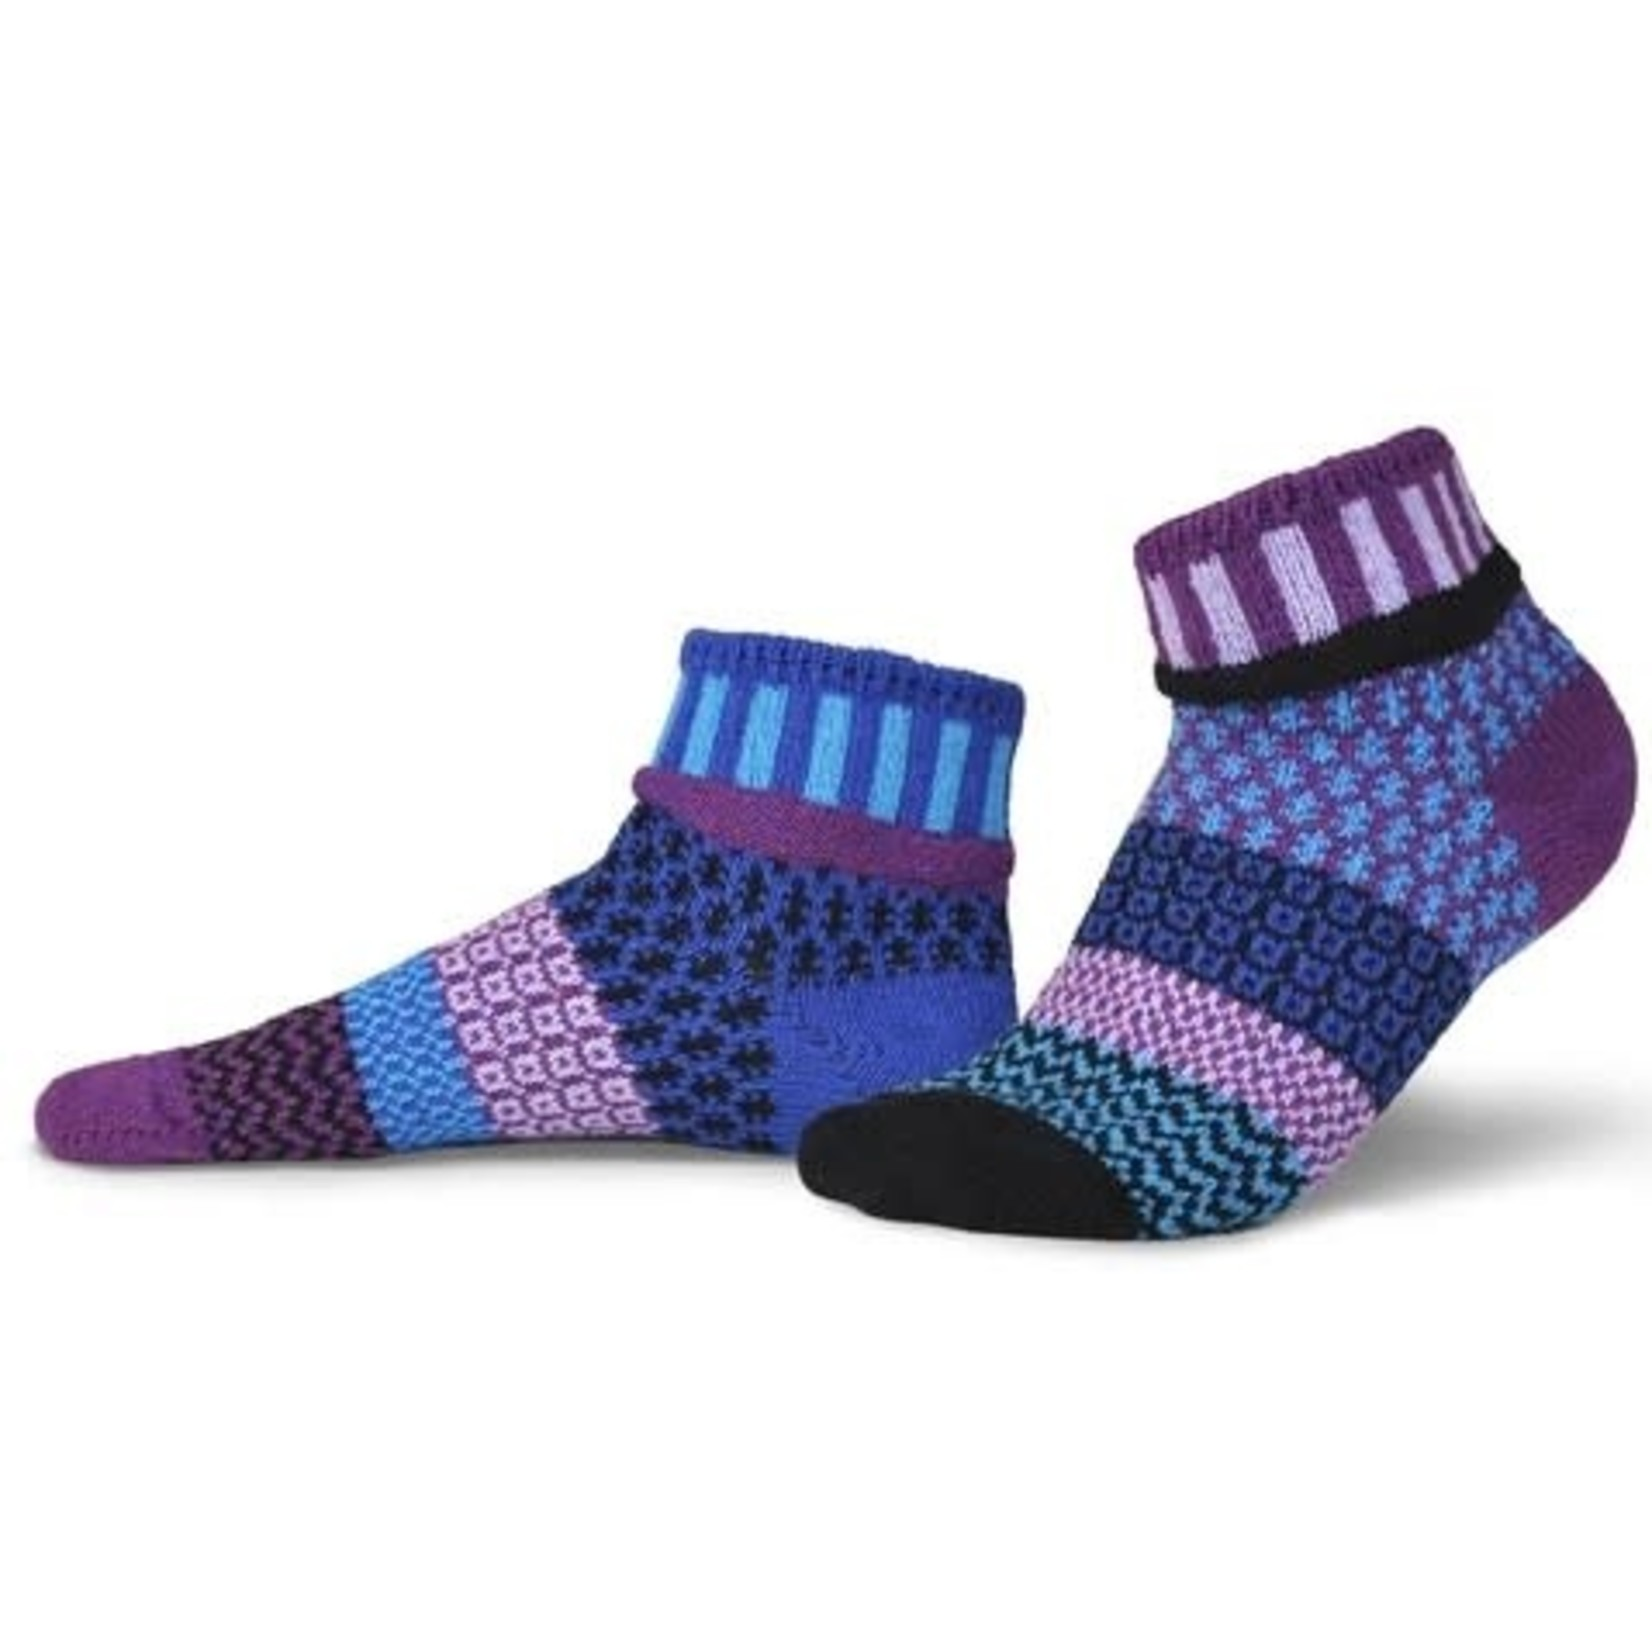 Solmates Solmate Socks Adult Quarter